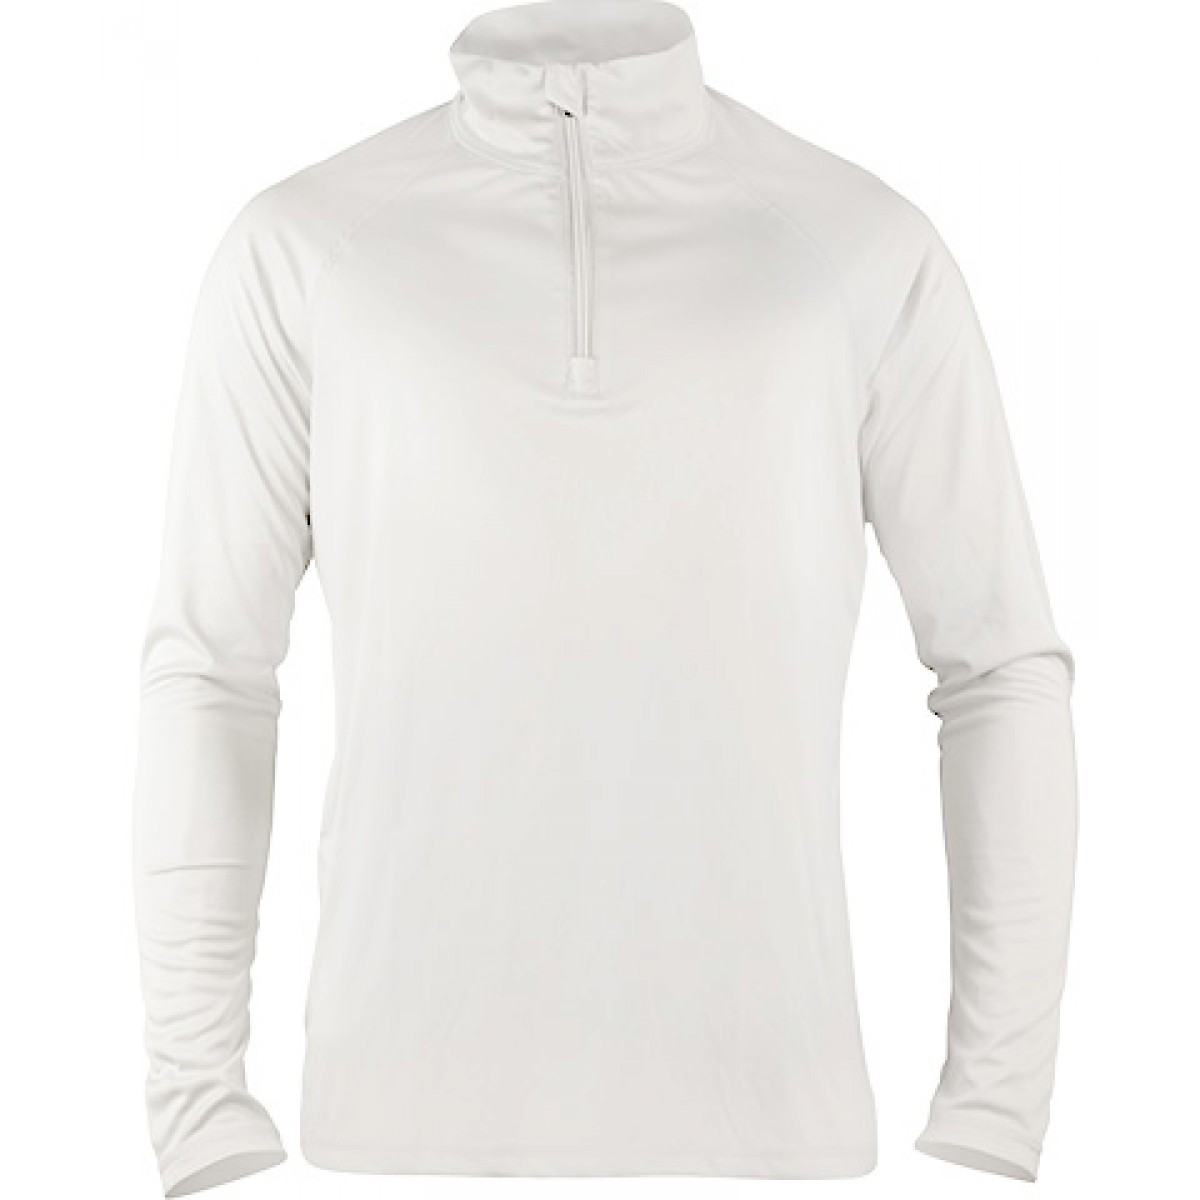 Quarter-Zip Lightweight Pullover-White-L